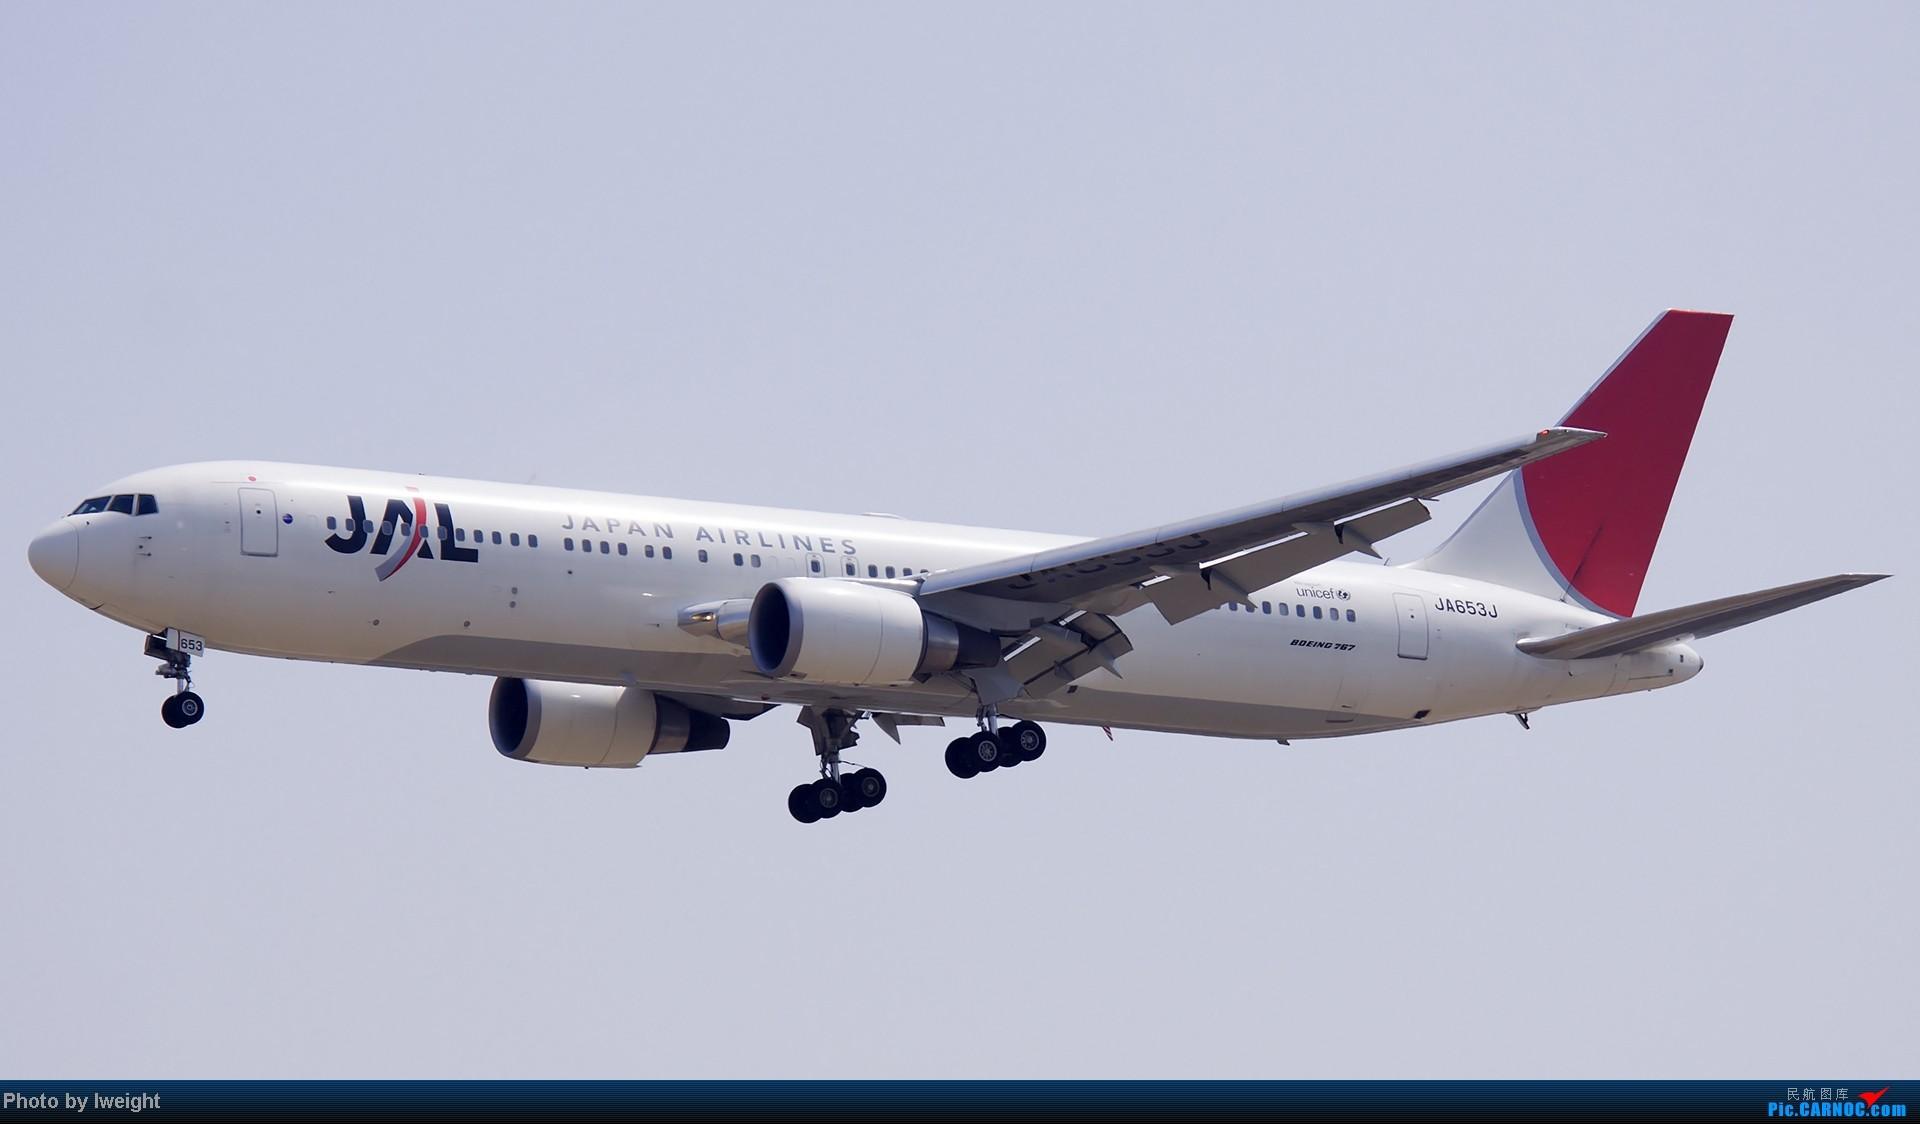 Re:[原创]错过了卡航的巴塞罗那号,只有这些大路货了,泪奔啊 BOEING 767-300 JA653J 中国北京首都机场